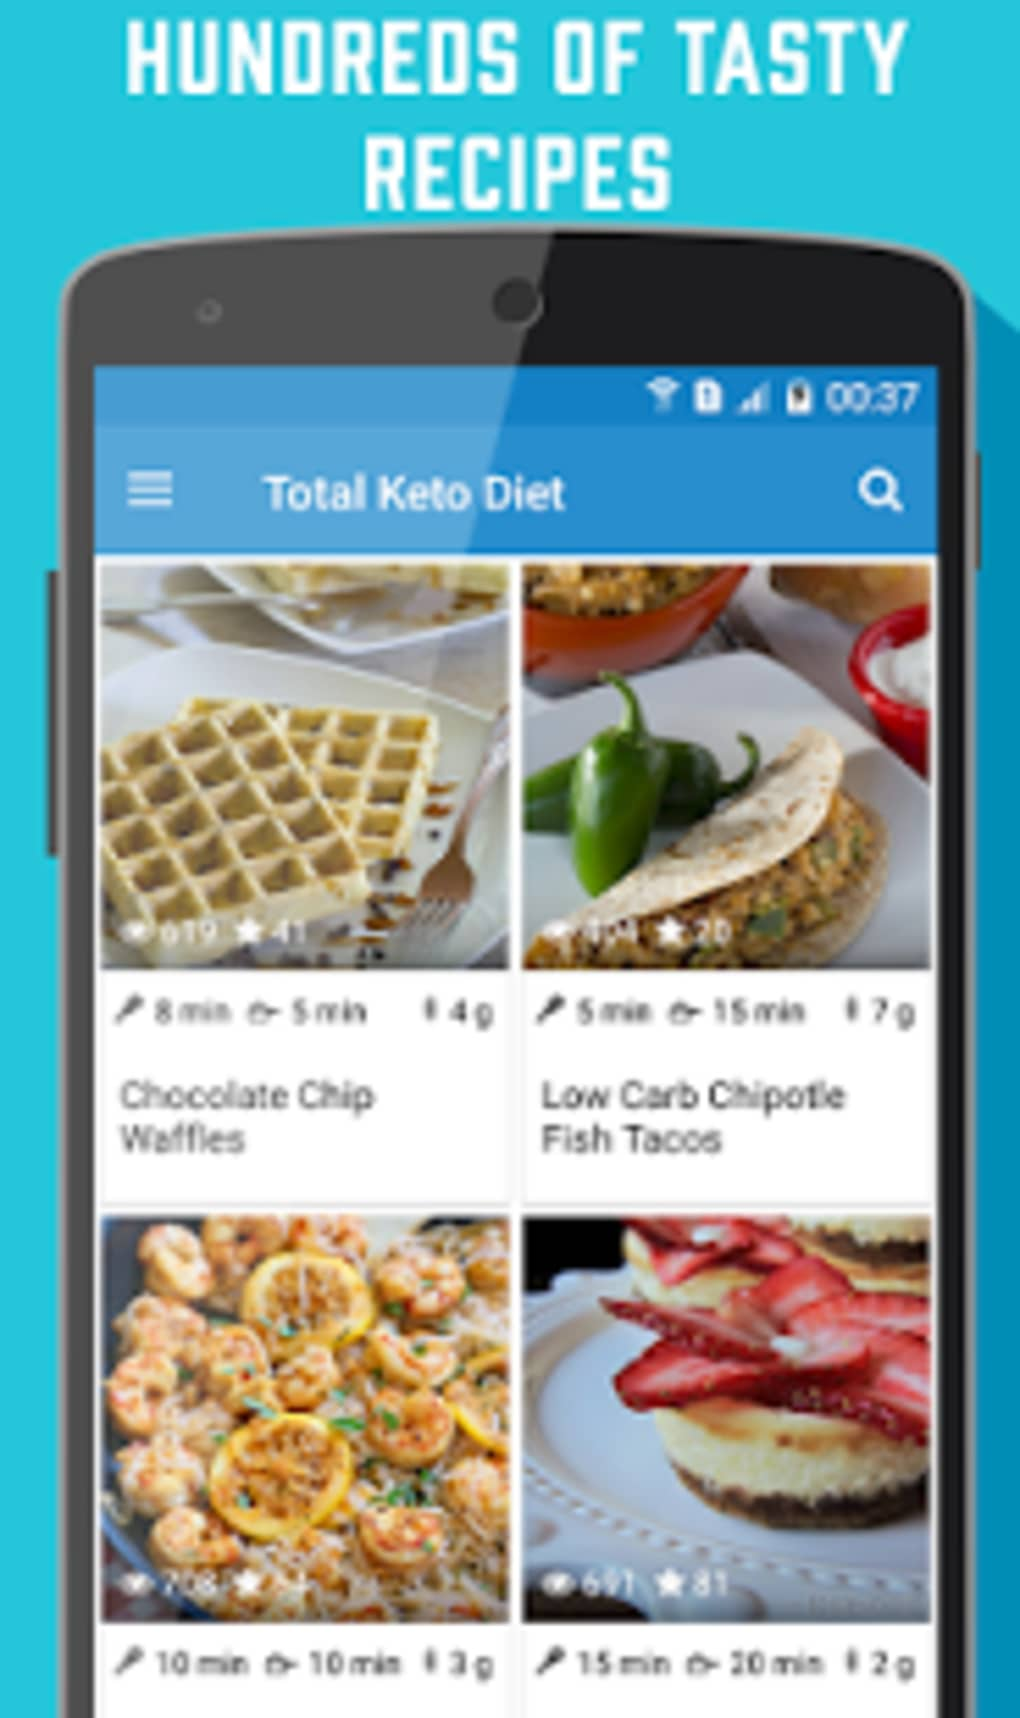 Total Keto Diet